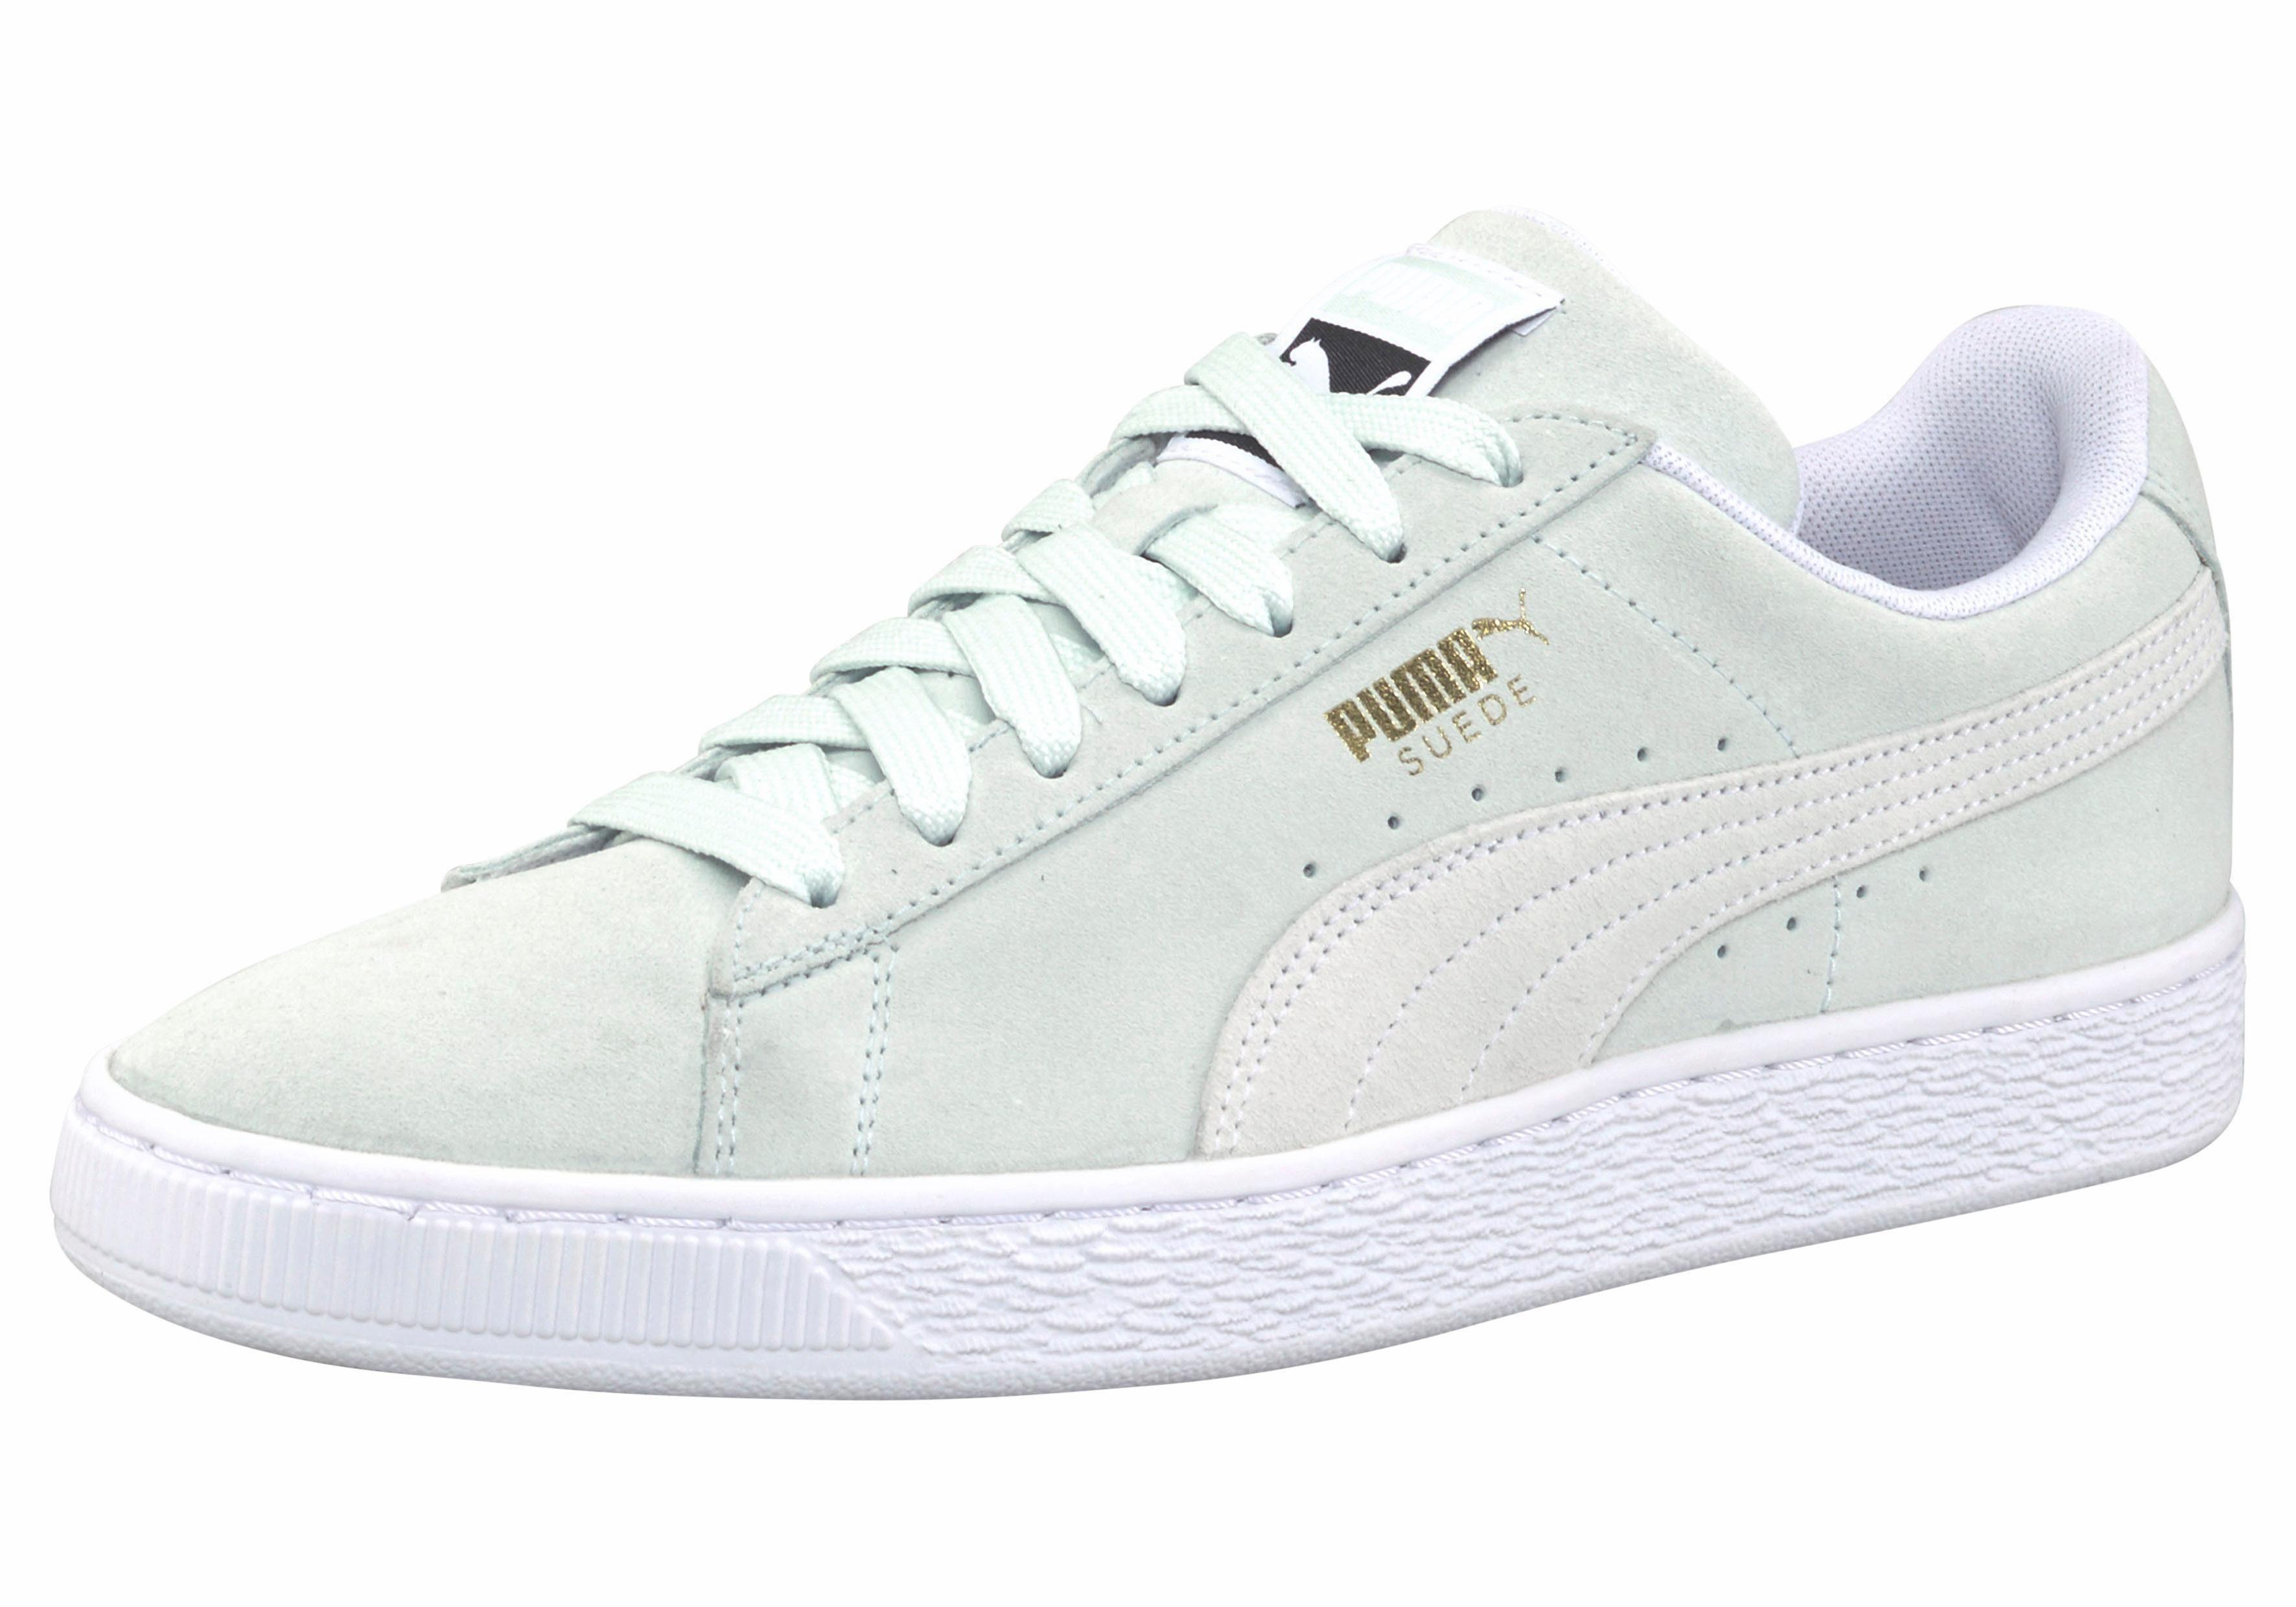 PUMA Suede Classic W Sneaker online kaufen  mint